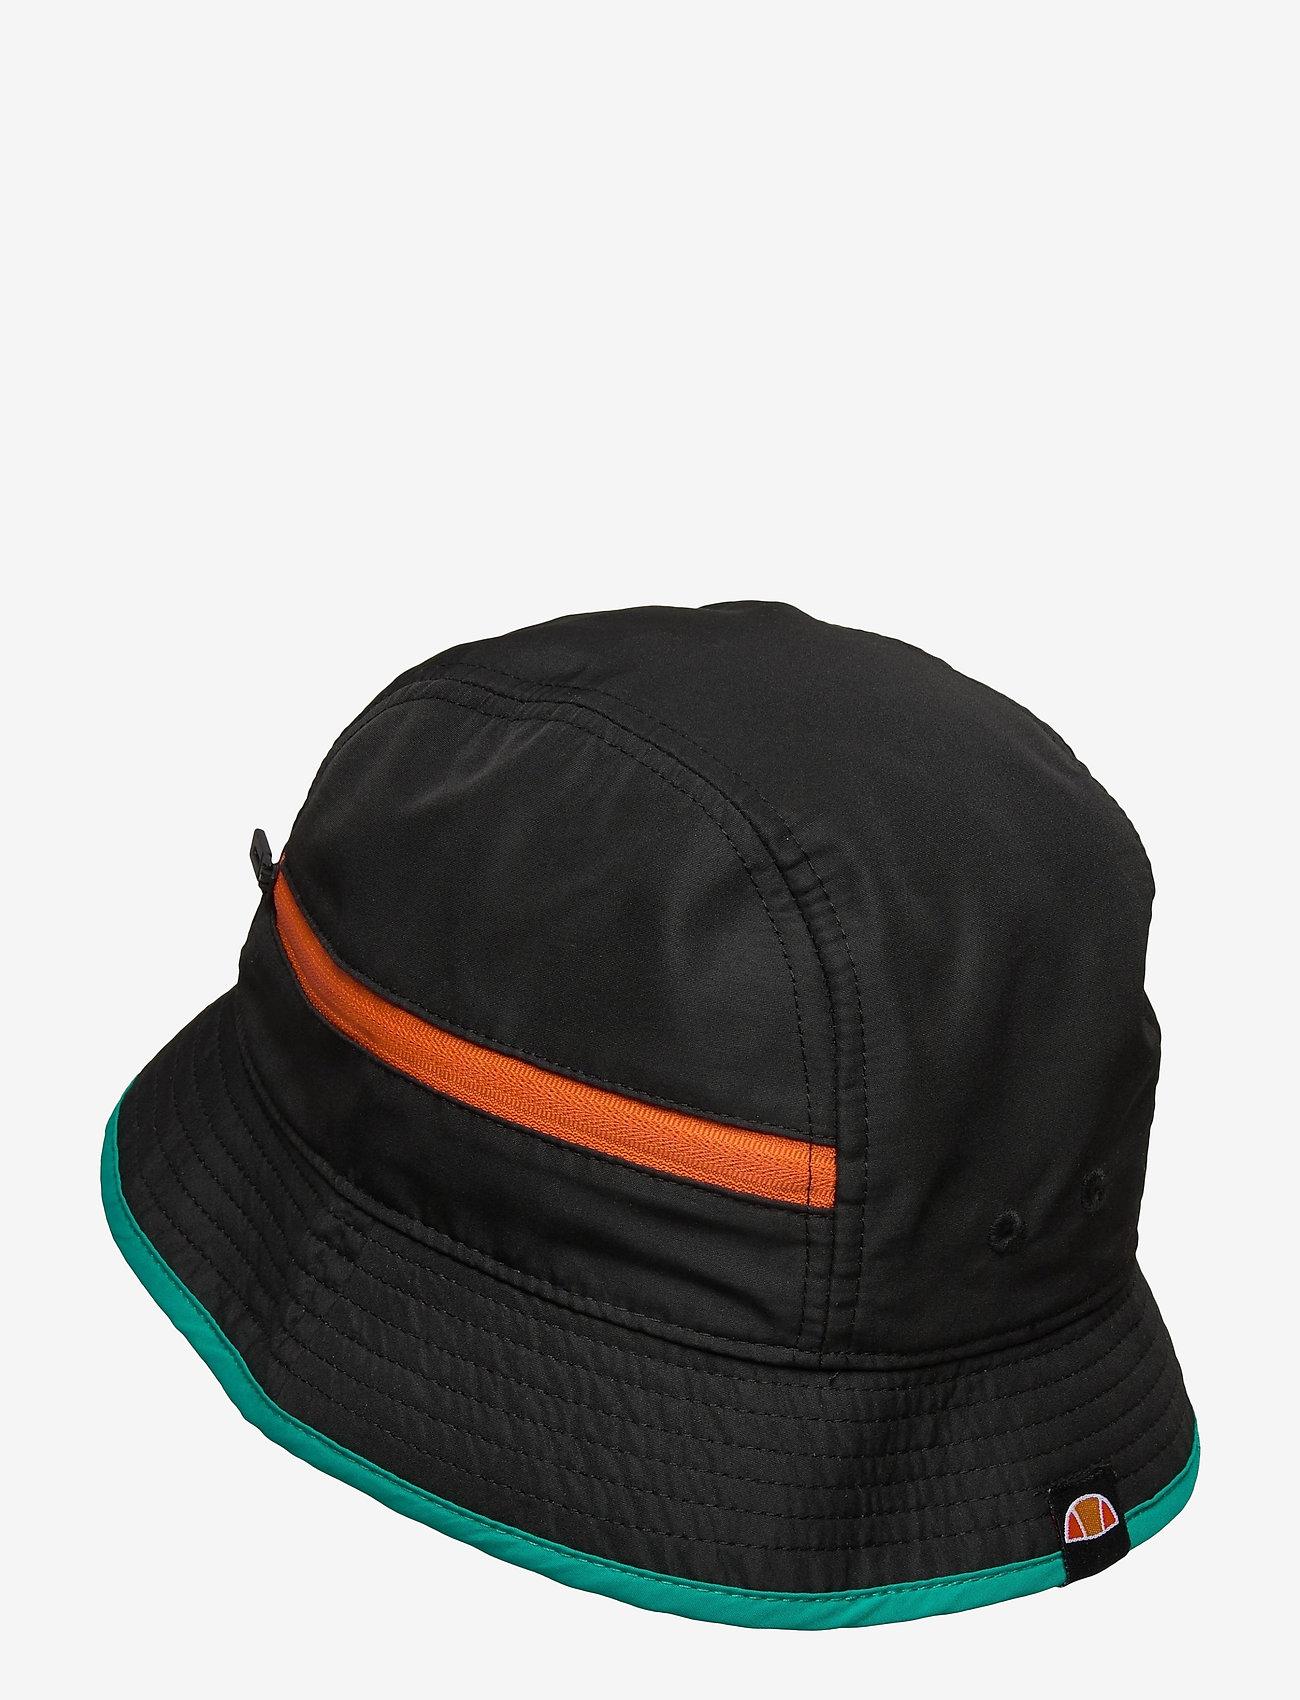 Ellesse - EL SUREFOO BUCKET HAT - bucket hats - black - 1